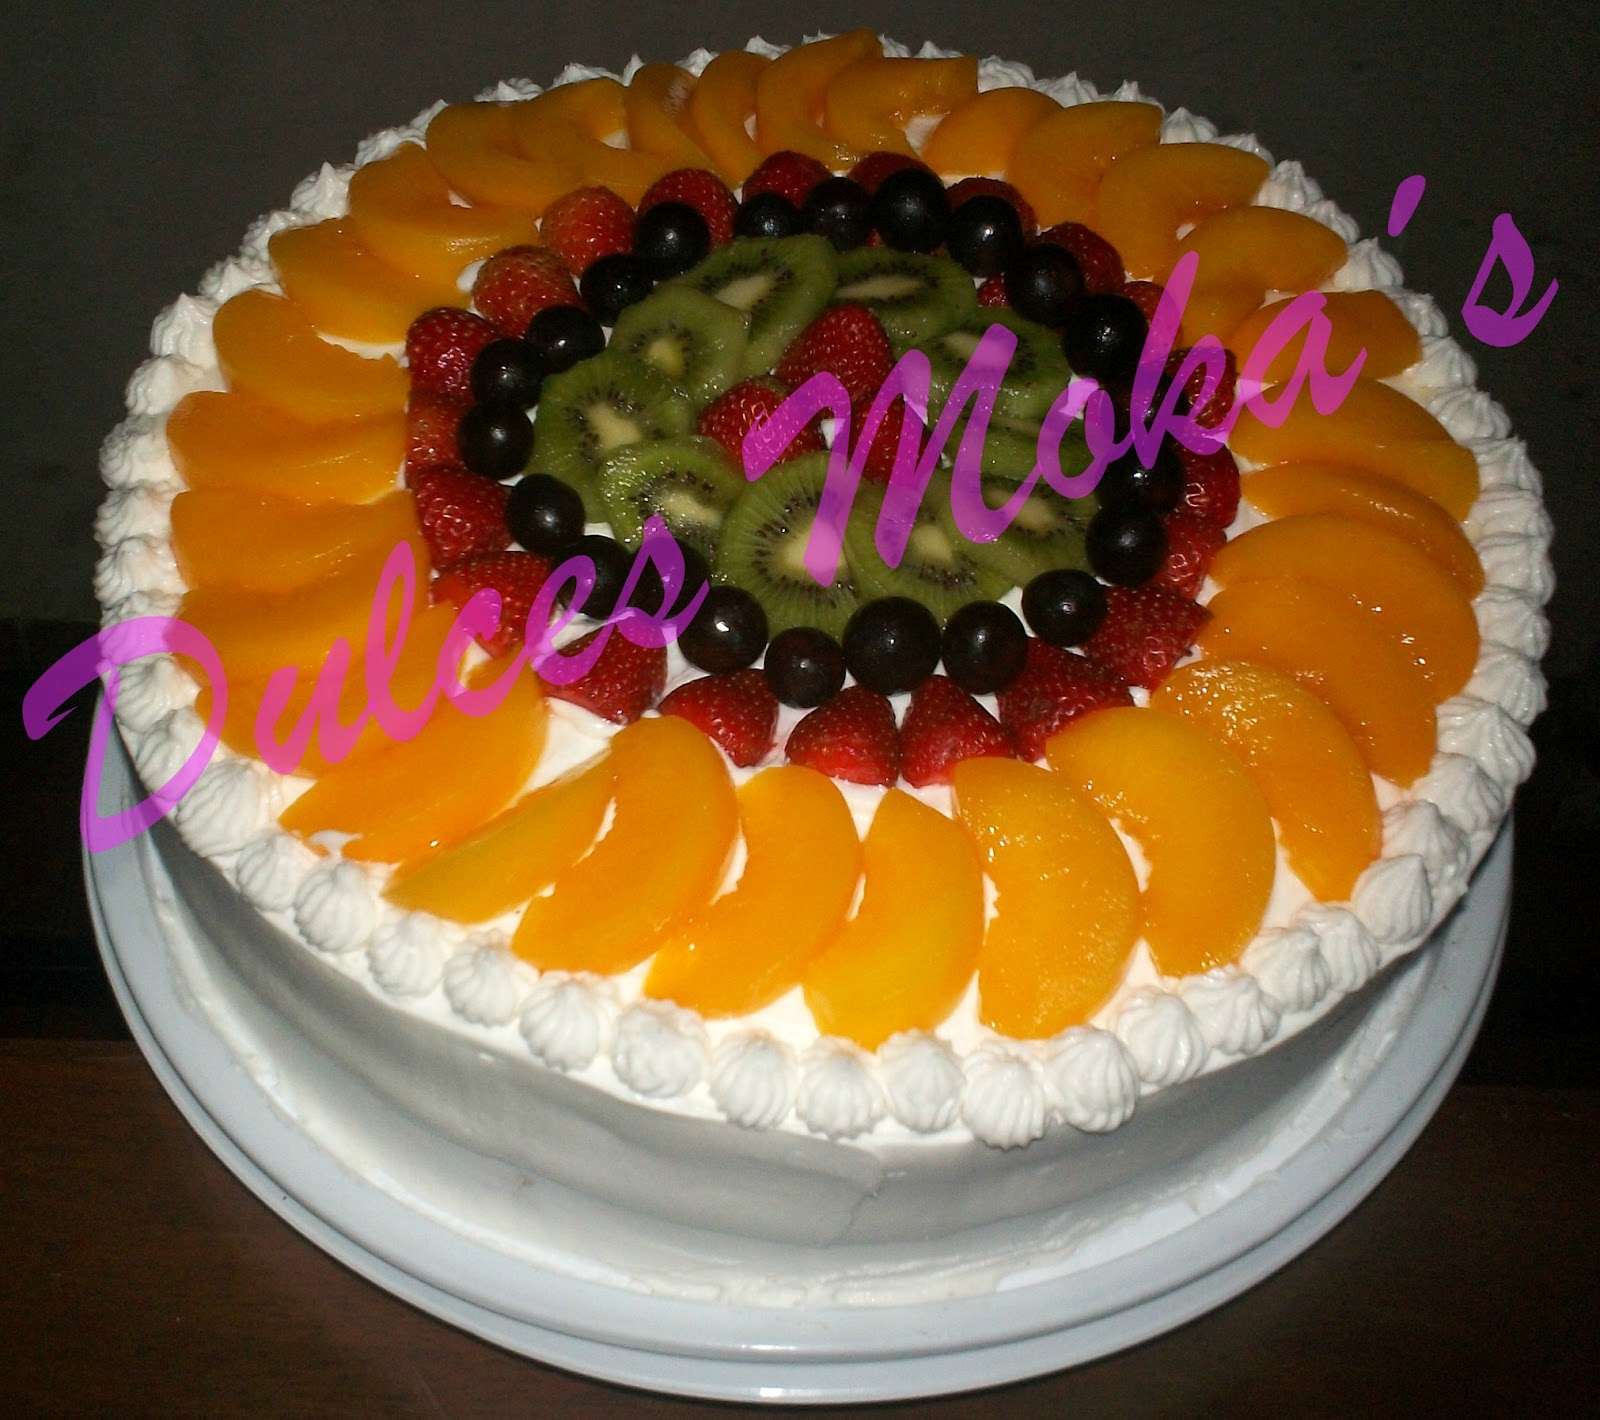 Top decoracion de pasteles con frutas images for pinterest - Decoracion de tortas ...